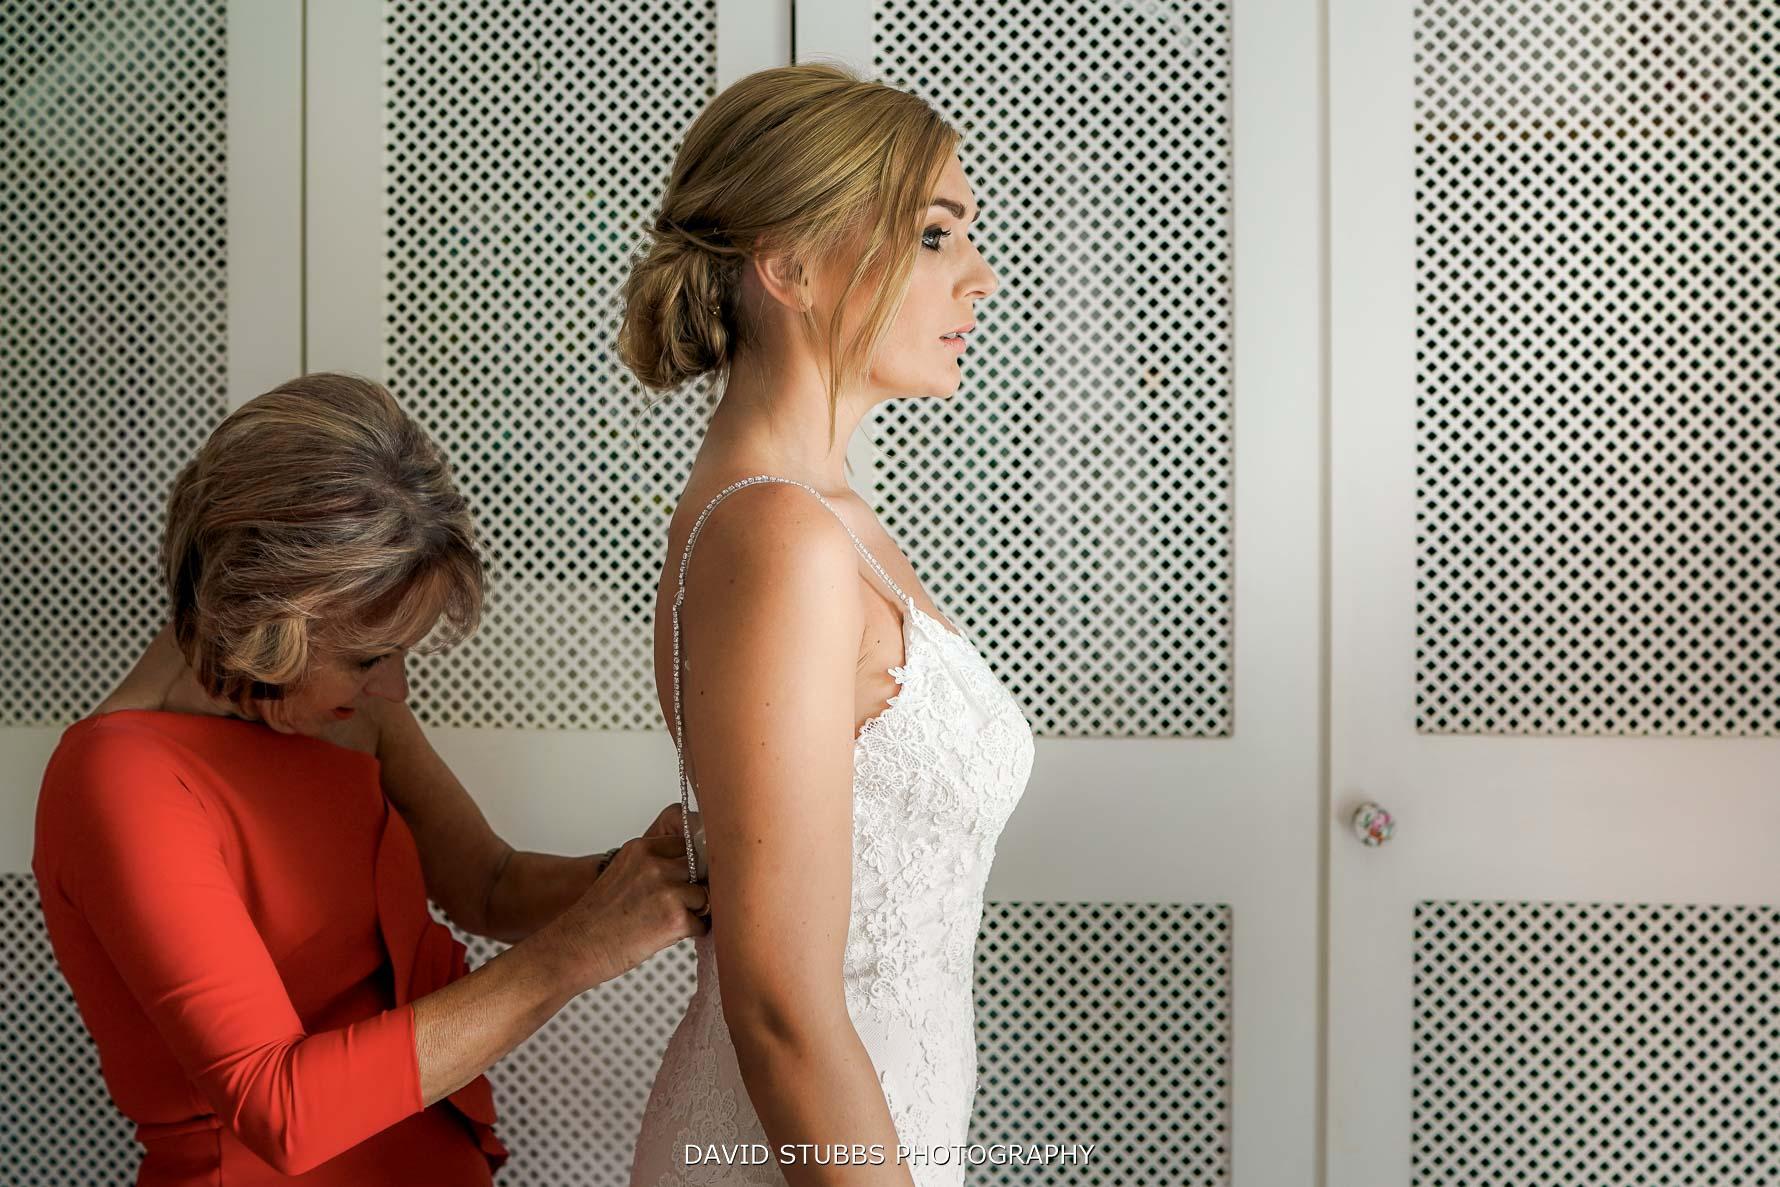 side on composition of bride having her wedding dress put on